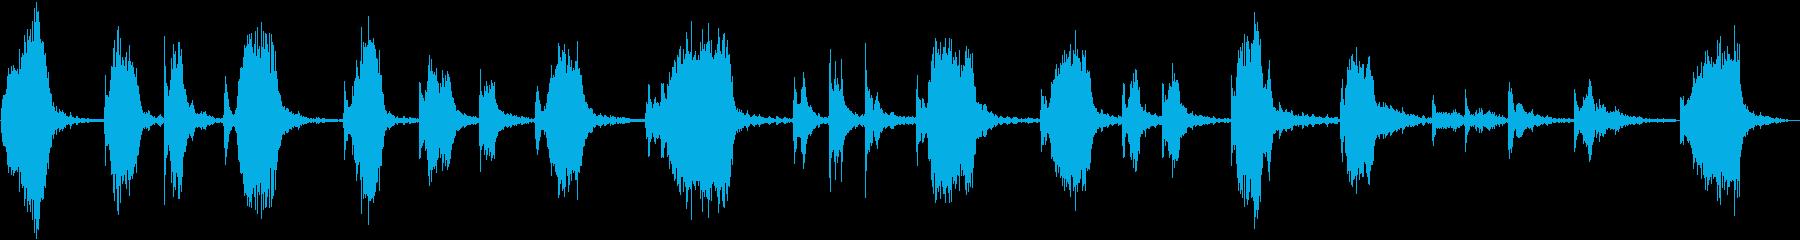 FAN GARDEN RAKE:R...の再生済みの波形